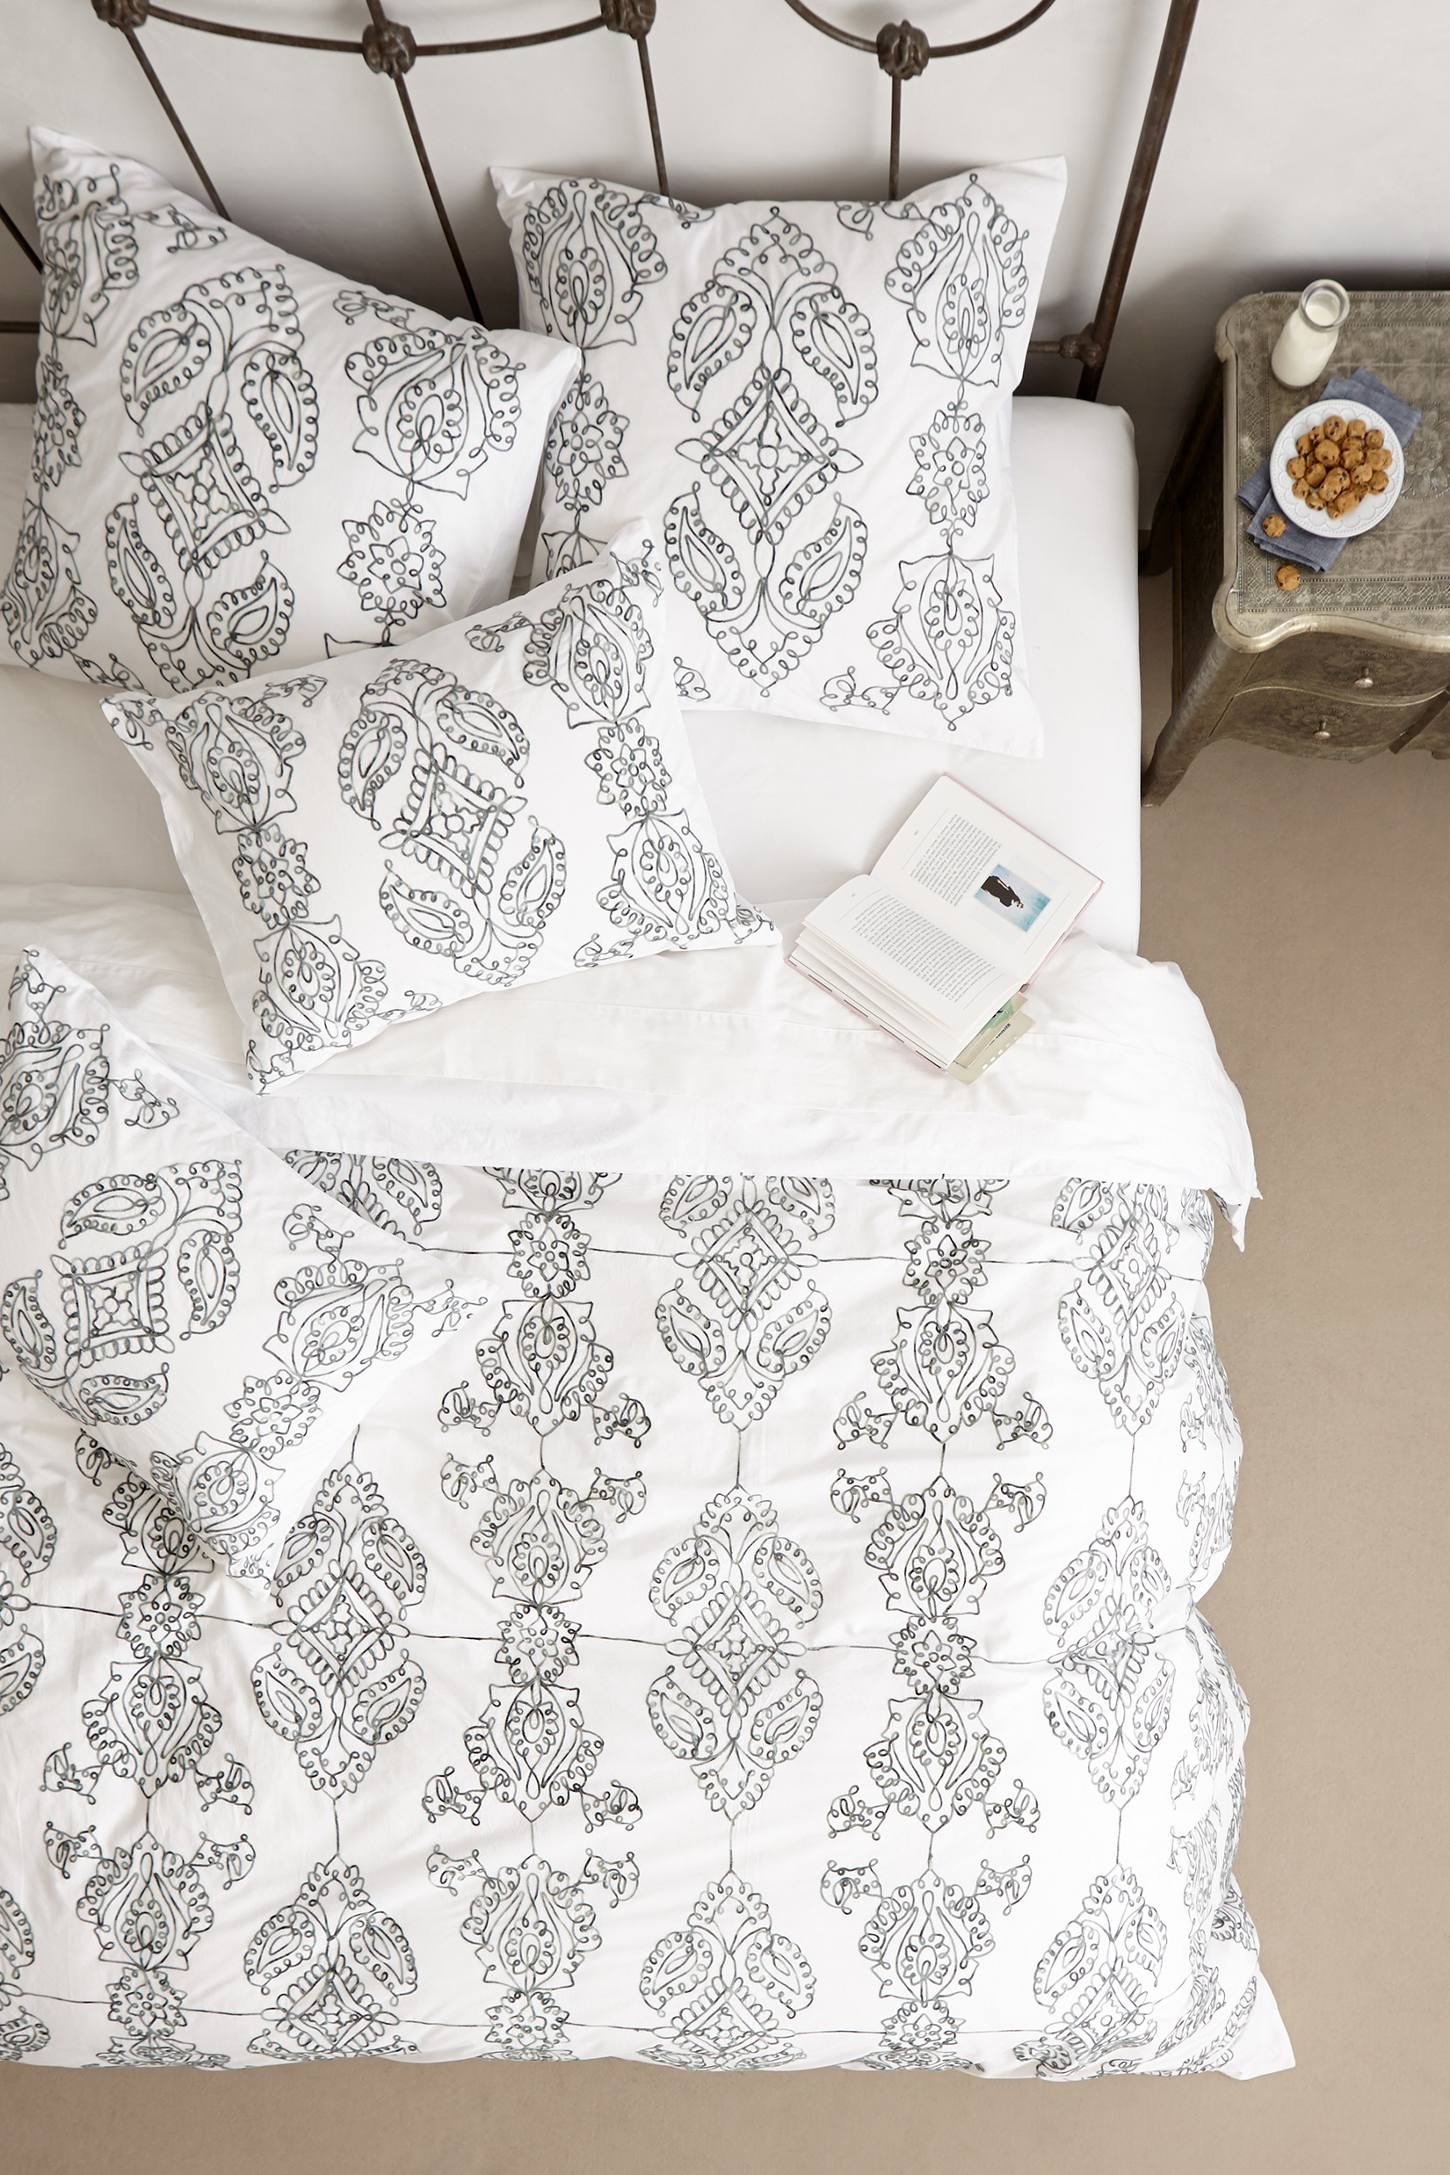 image shop duvets home department available all slumber duvet seasons sale no for daniadown bath bed